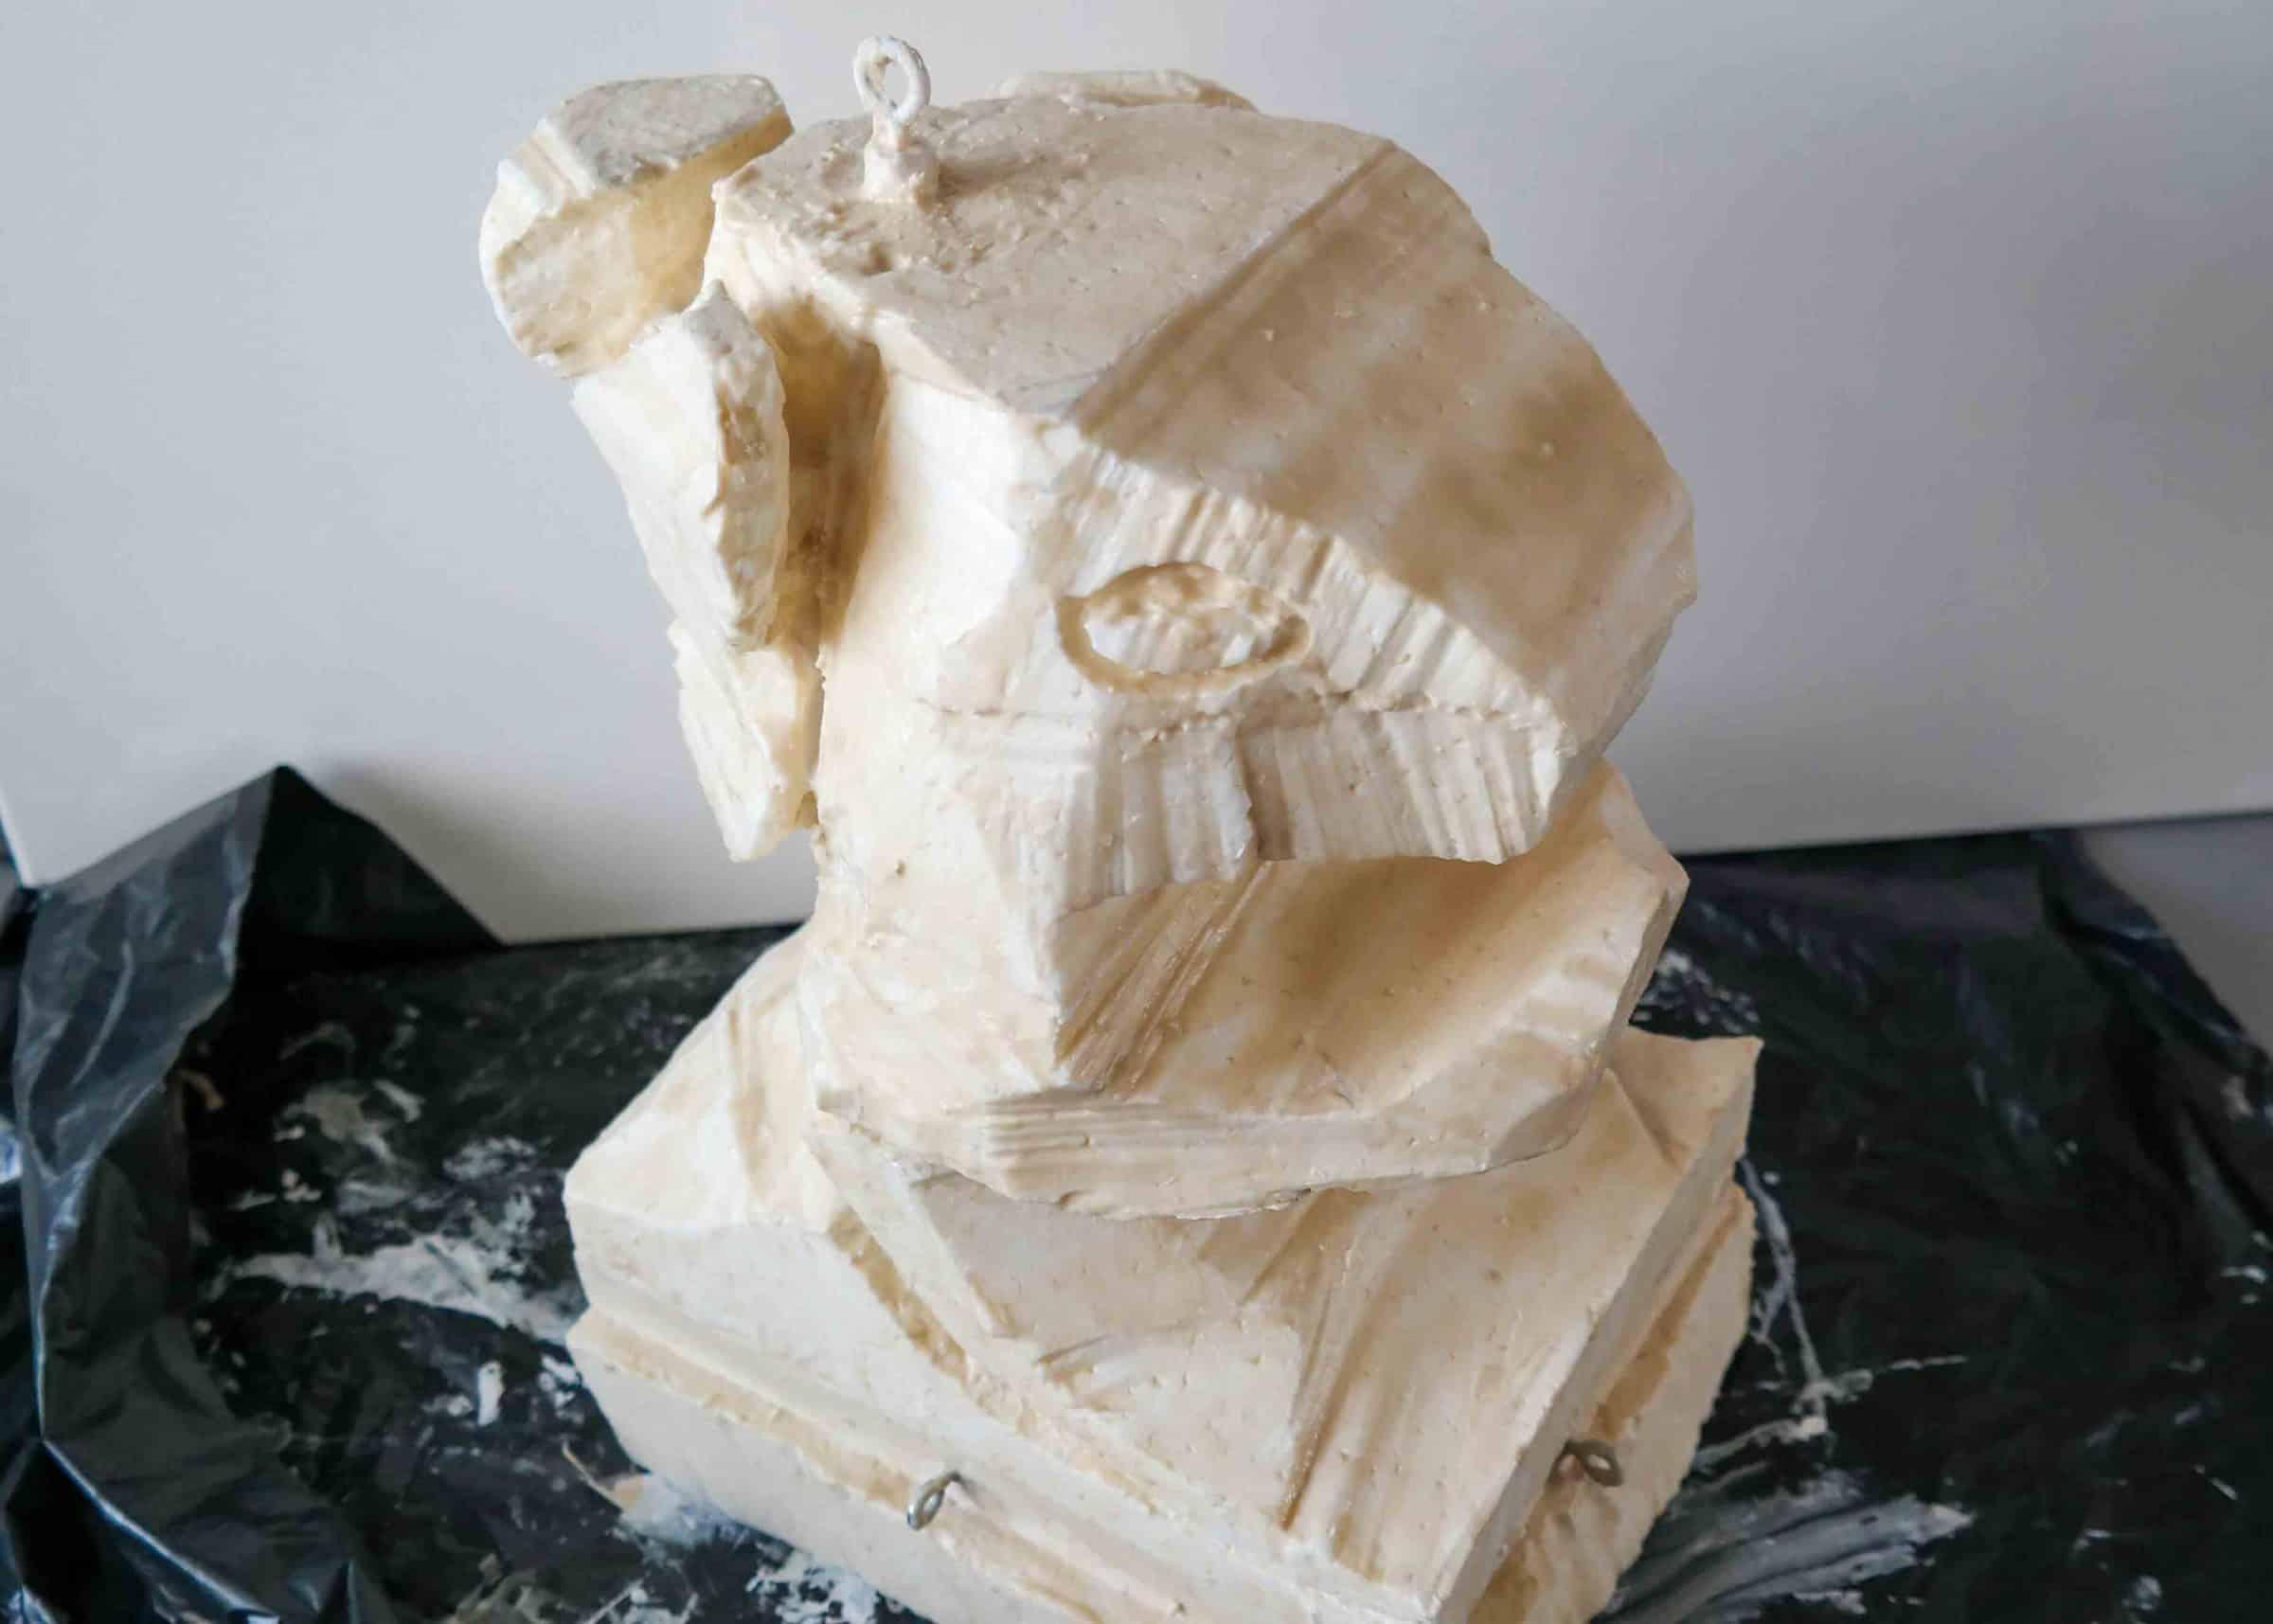 ALPHENART-test-statue-JABOScreations-Jasper-Bos-2